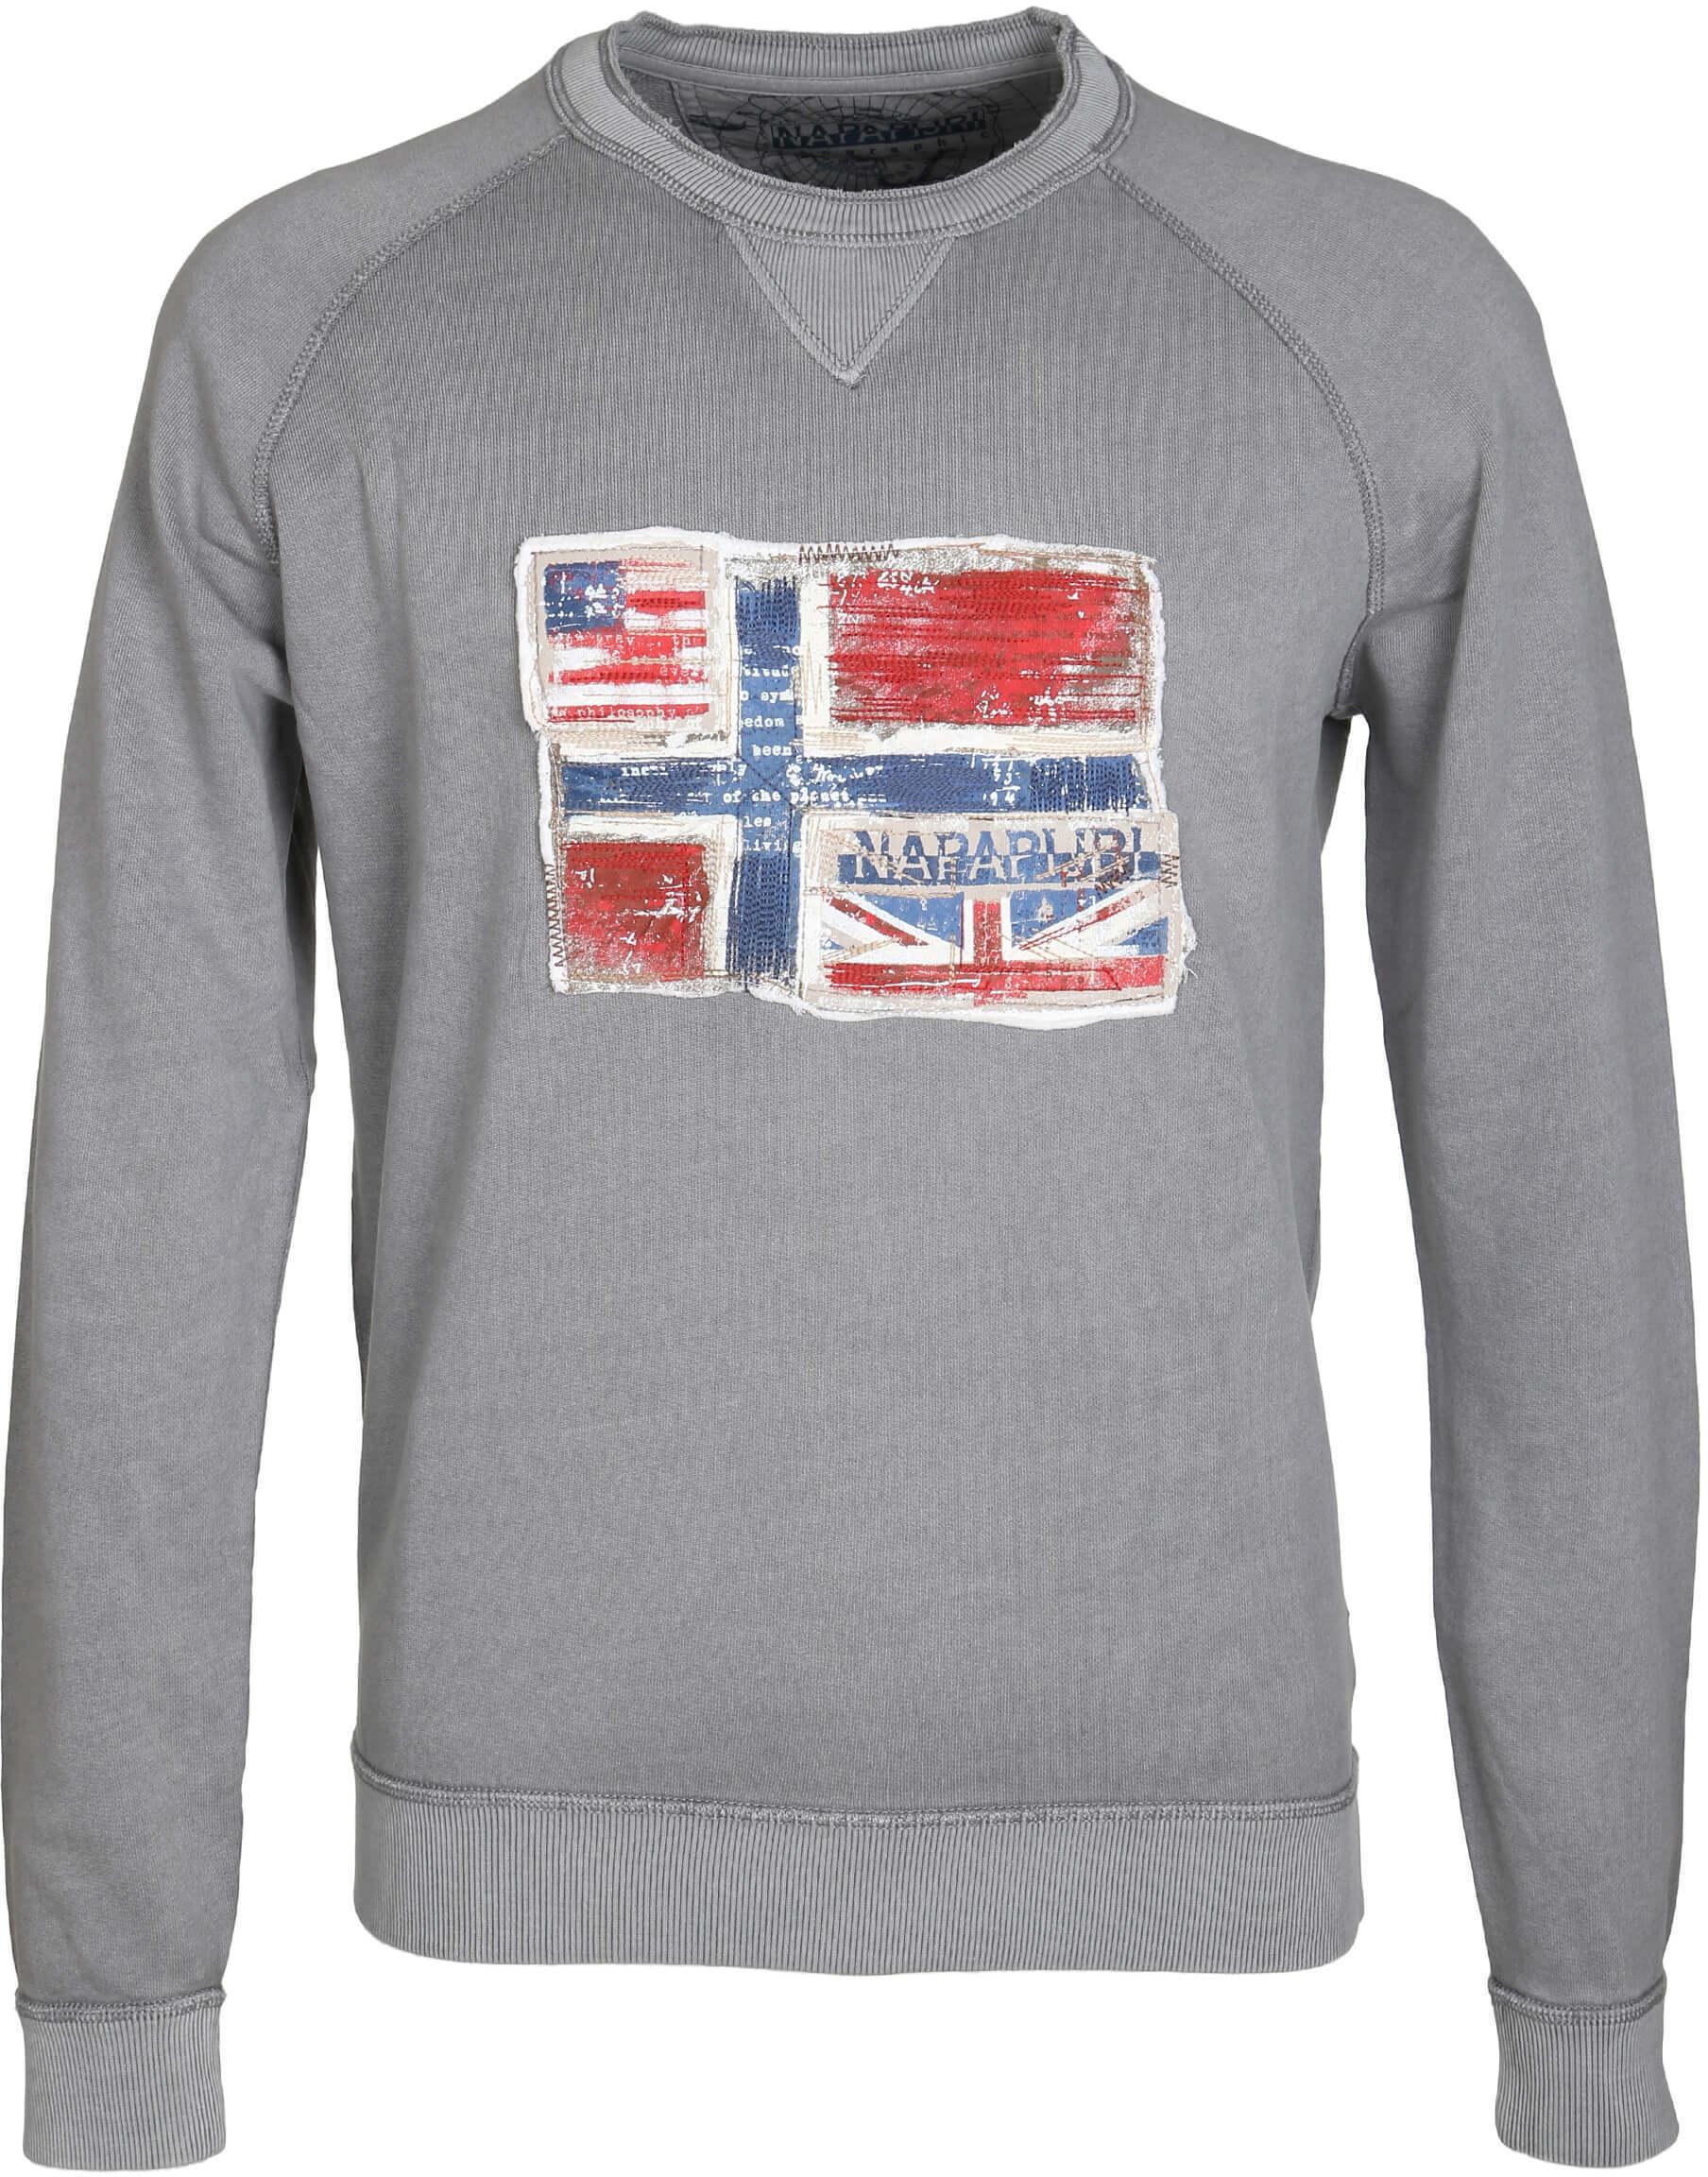 Napapijri Sweater Grijs foto 0